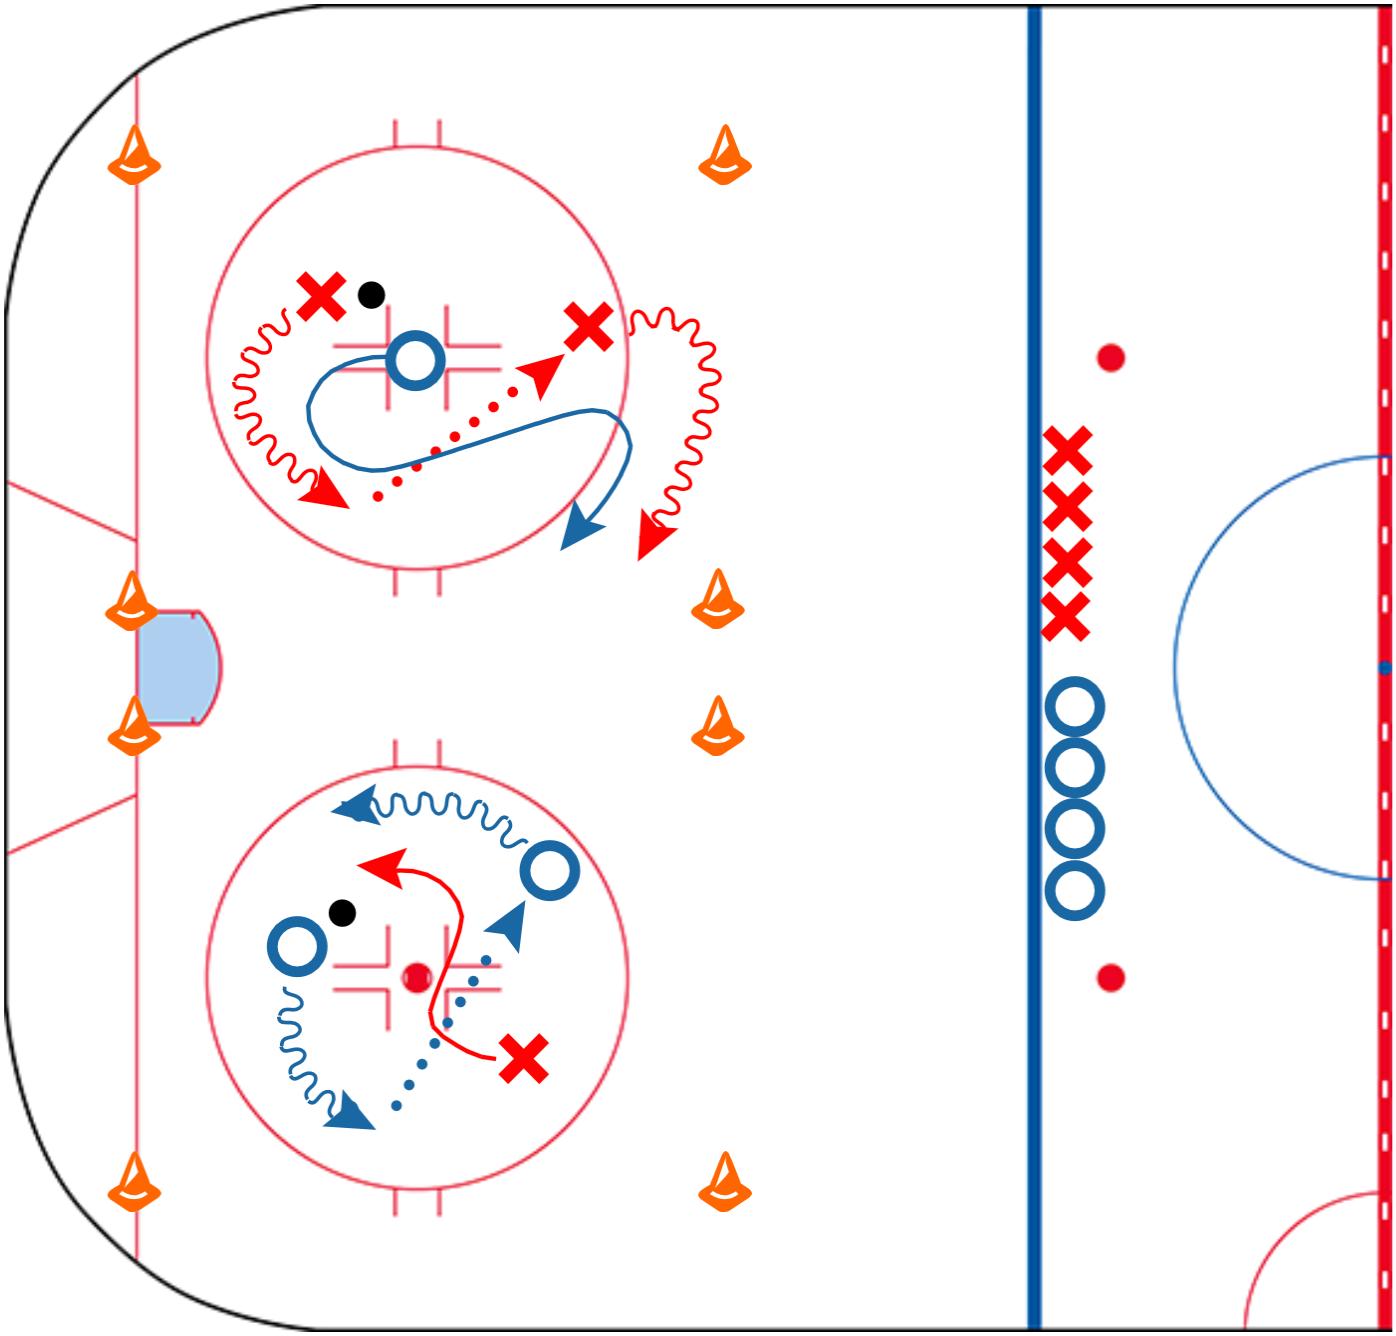 small-area-game-2vs1-keep-away-CoachThem